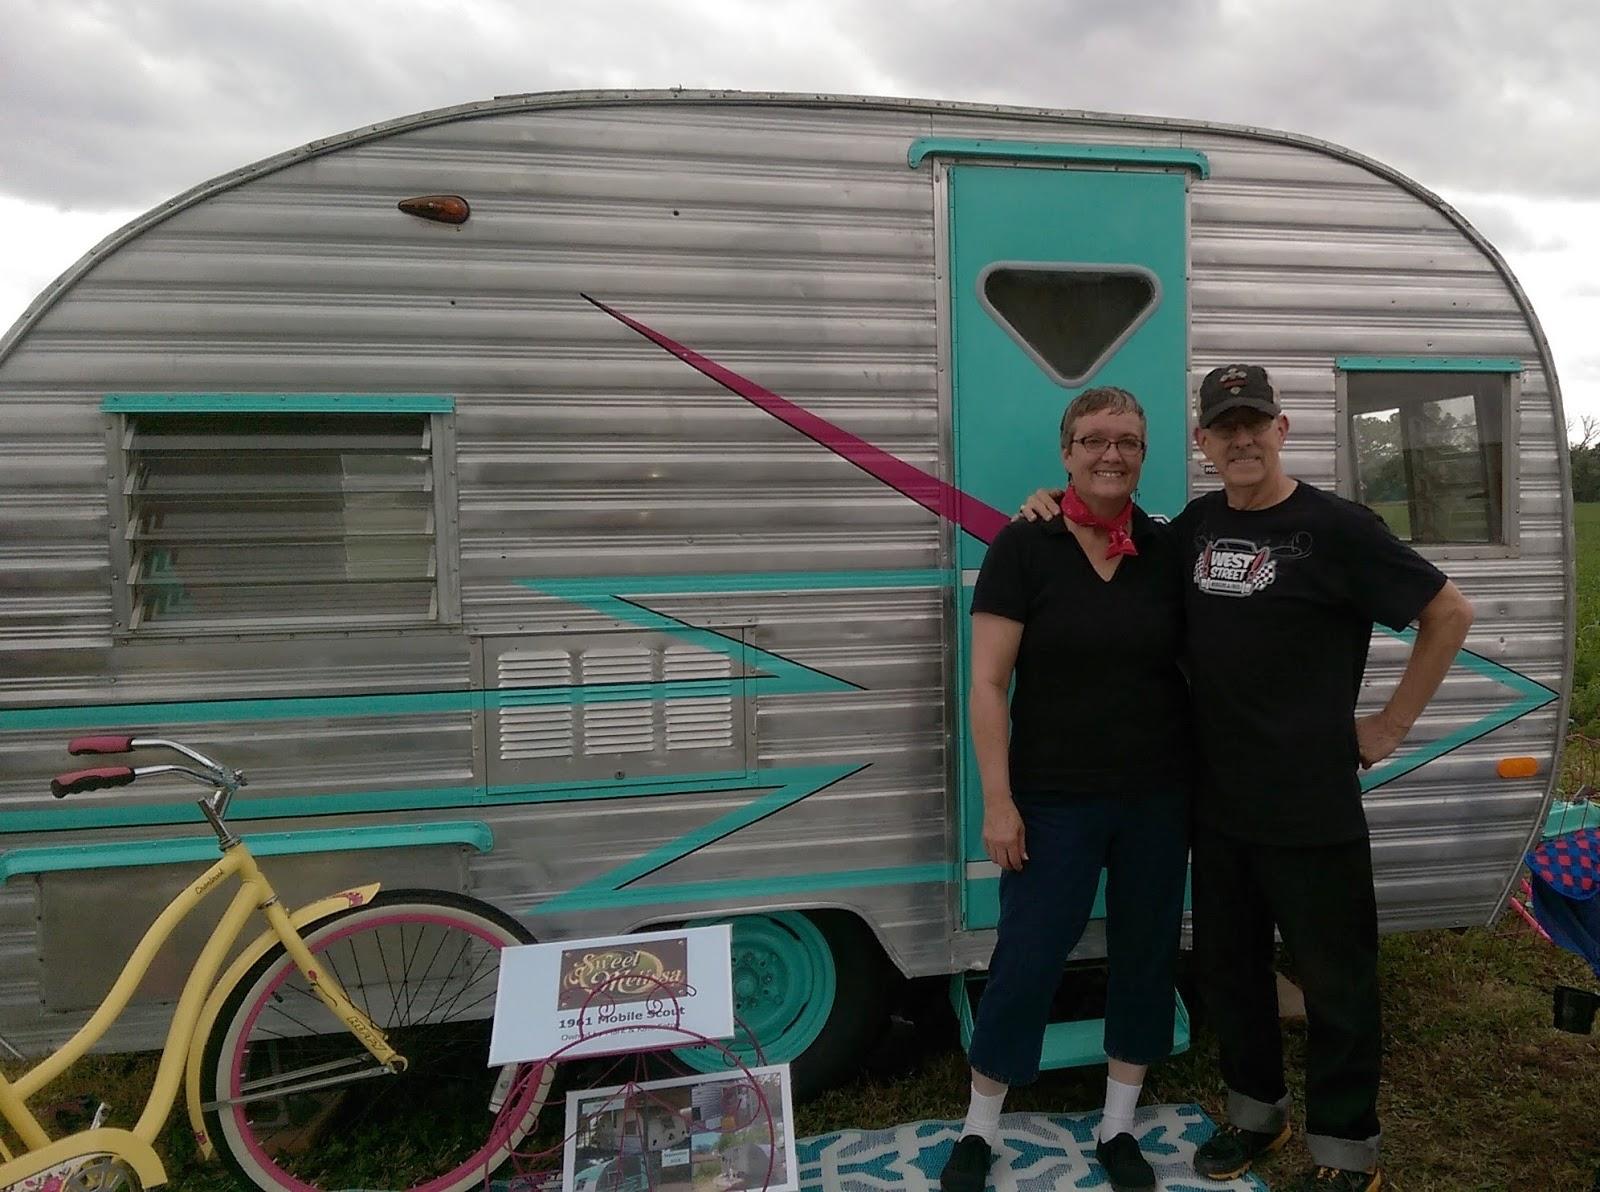 1961 Mobile Scout Rebuild Adventures: Of Vintage Camper Shows and